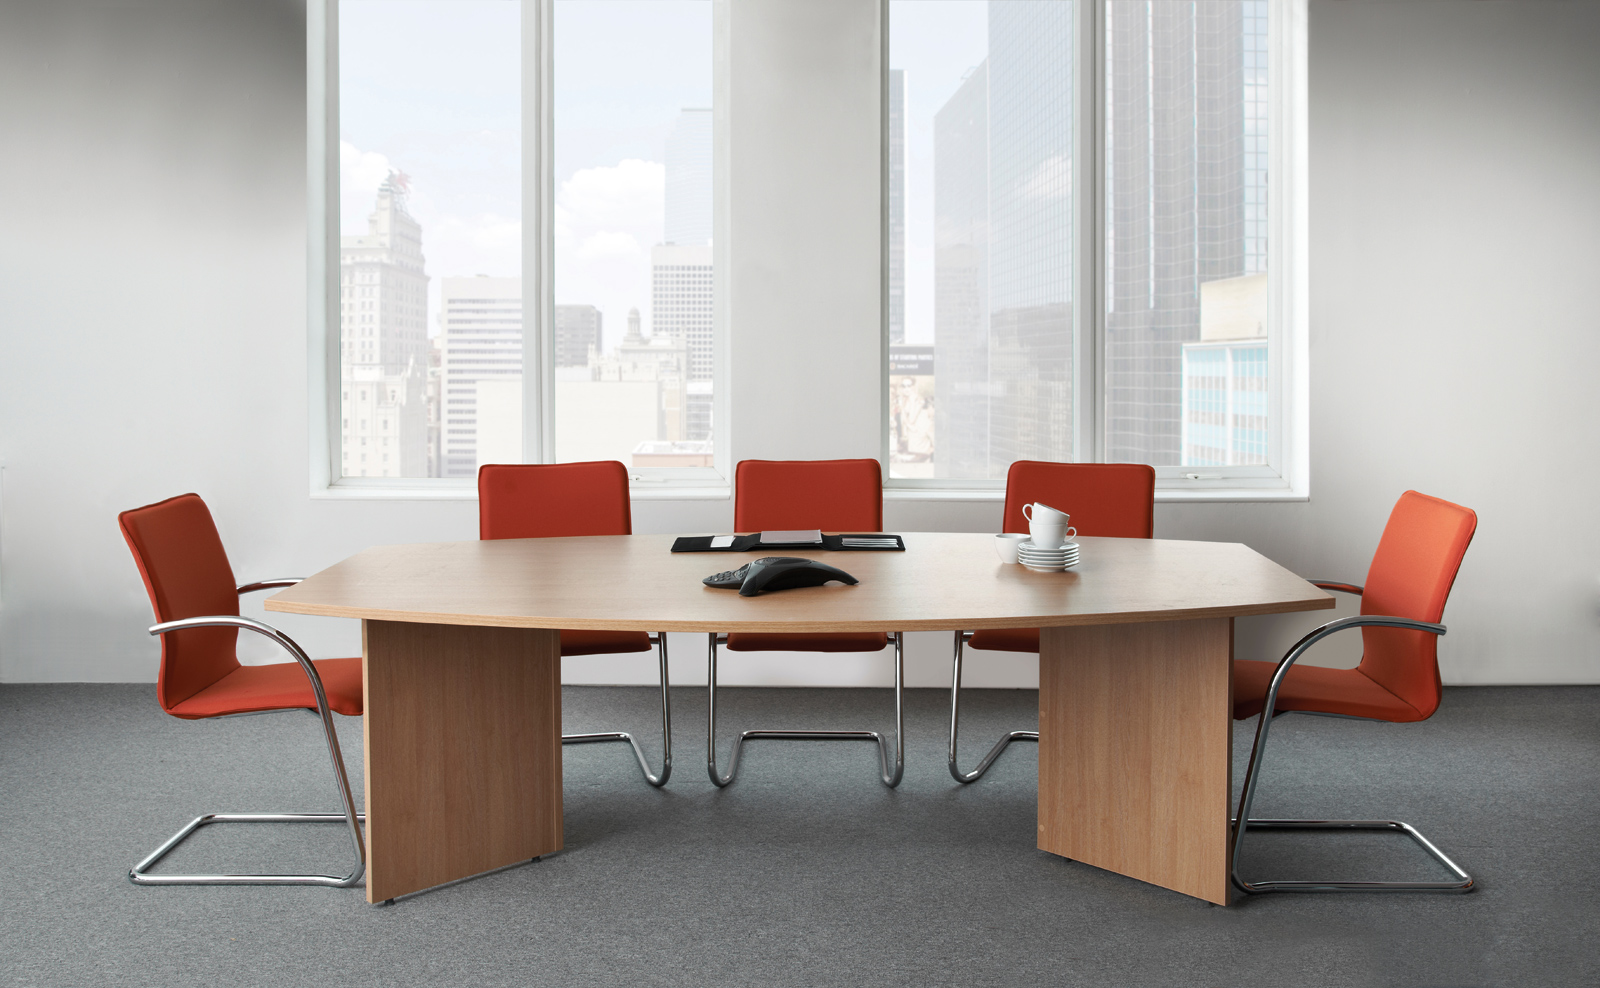 arrow office furniture. Arrow Office Furniture. Head Leg Circular Meeting Table 1200mm - Oak Business Furniture Direct F